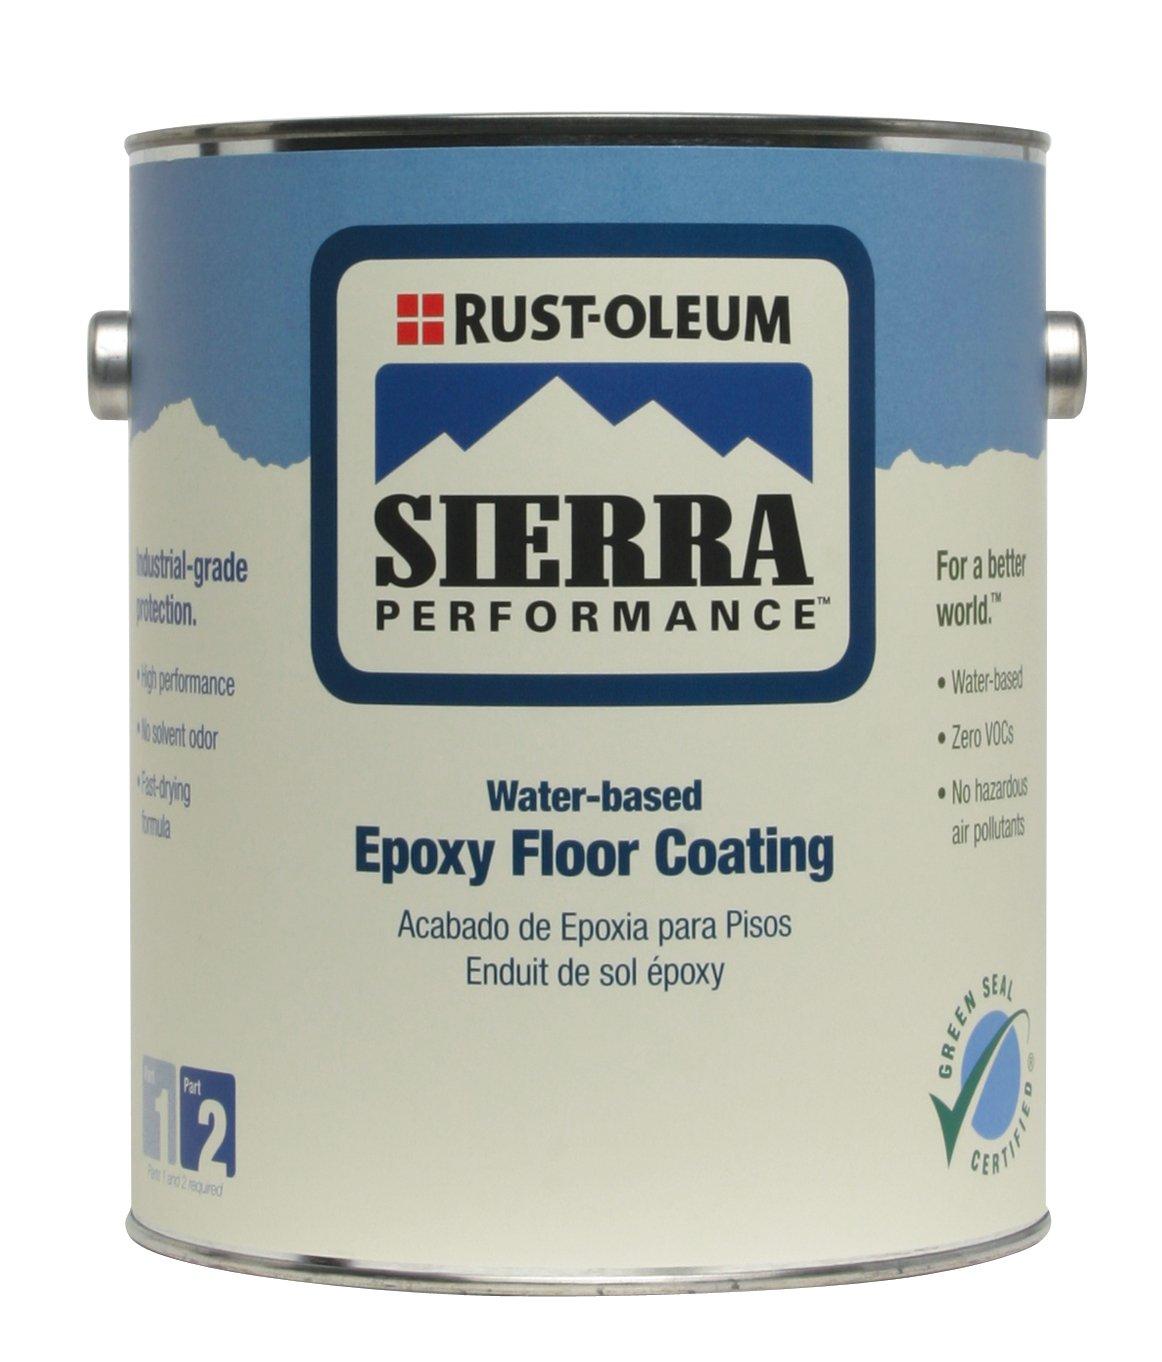 Rust-Oleum 208086 Sierra Performance S40 System Zero VOC Water-Based Epoxy Floor Coating Activator, 1-Gallon, 2-Pack